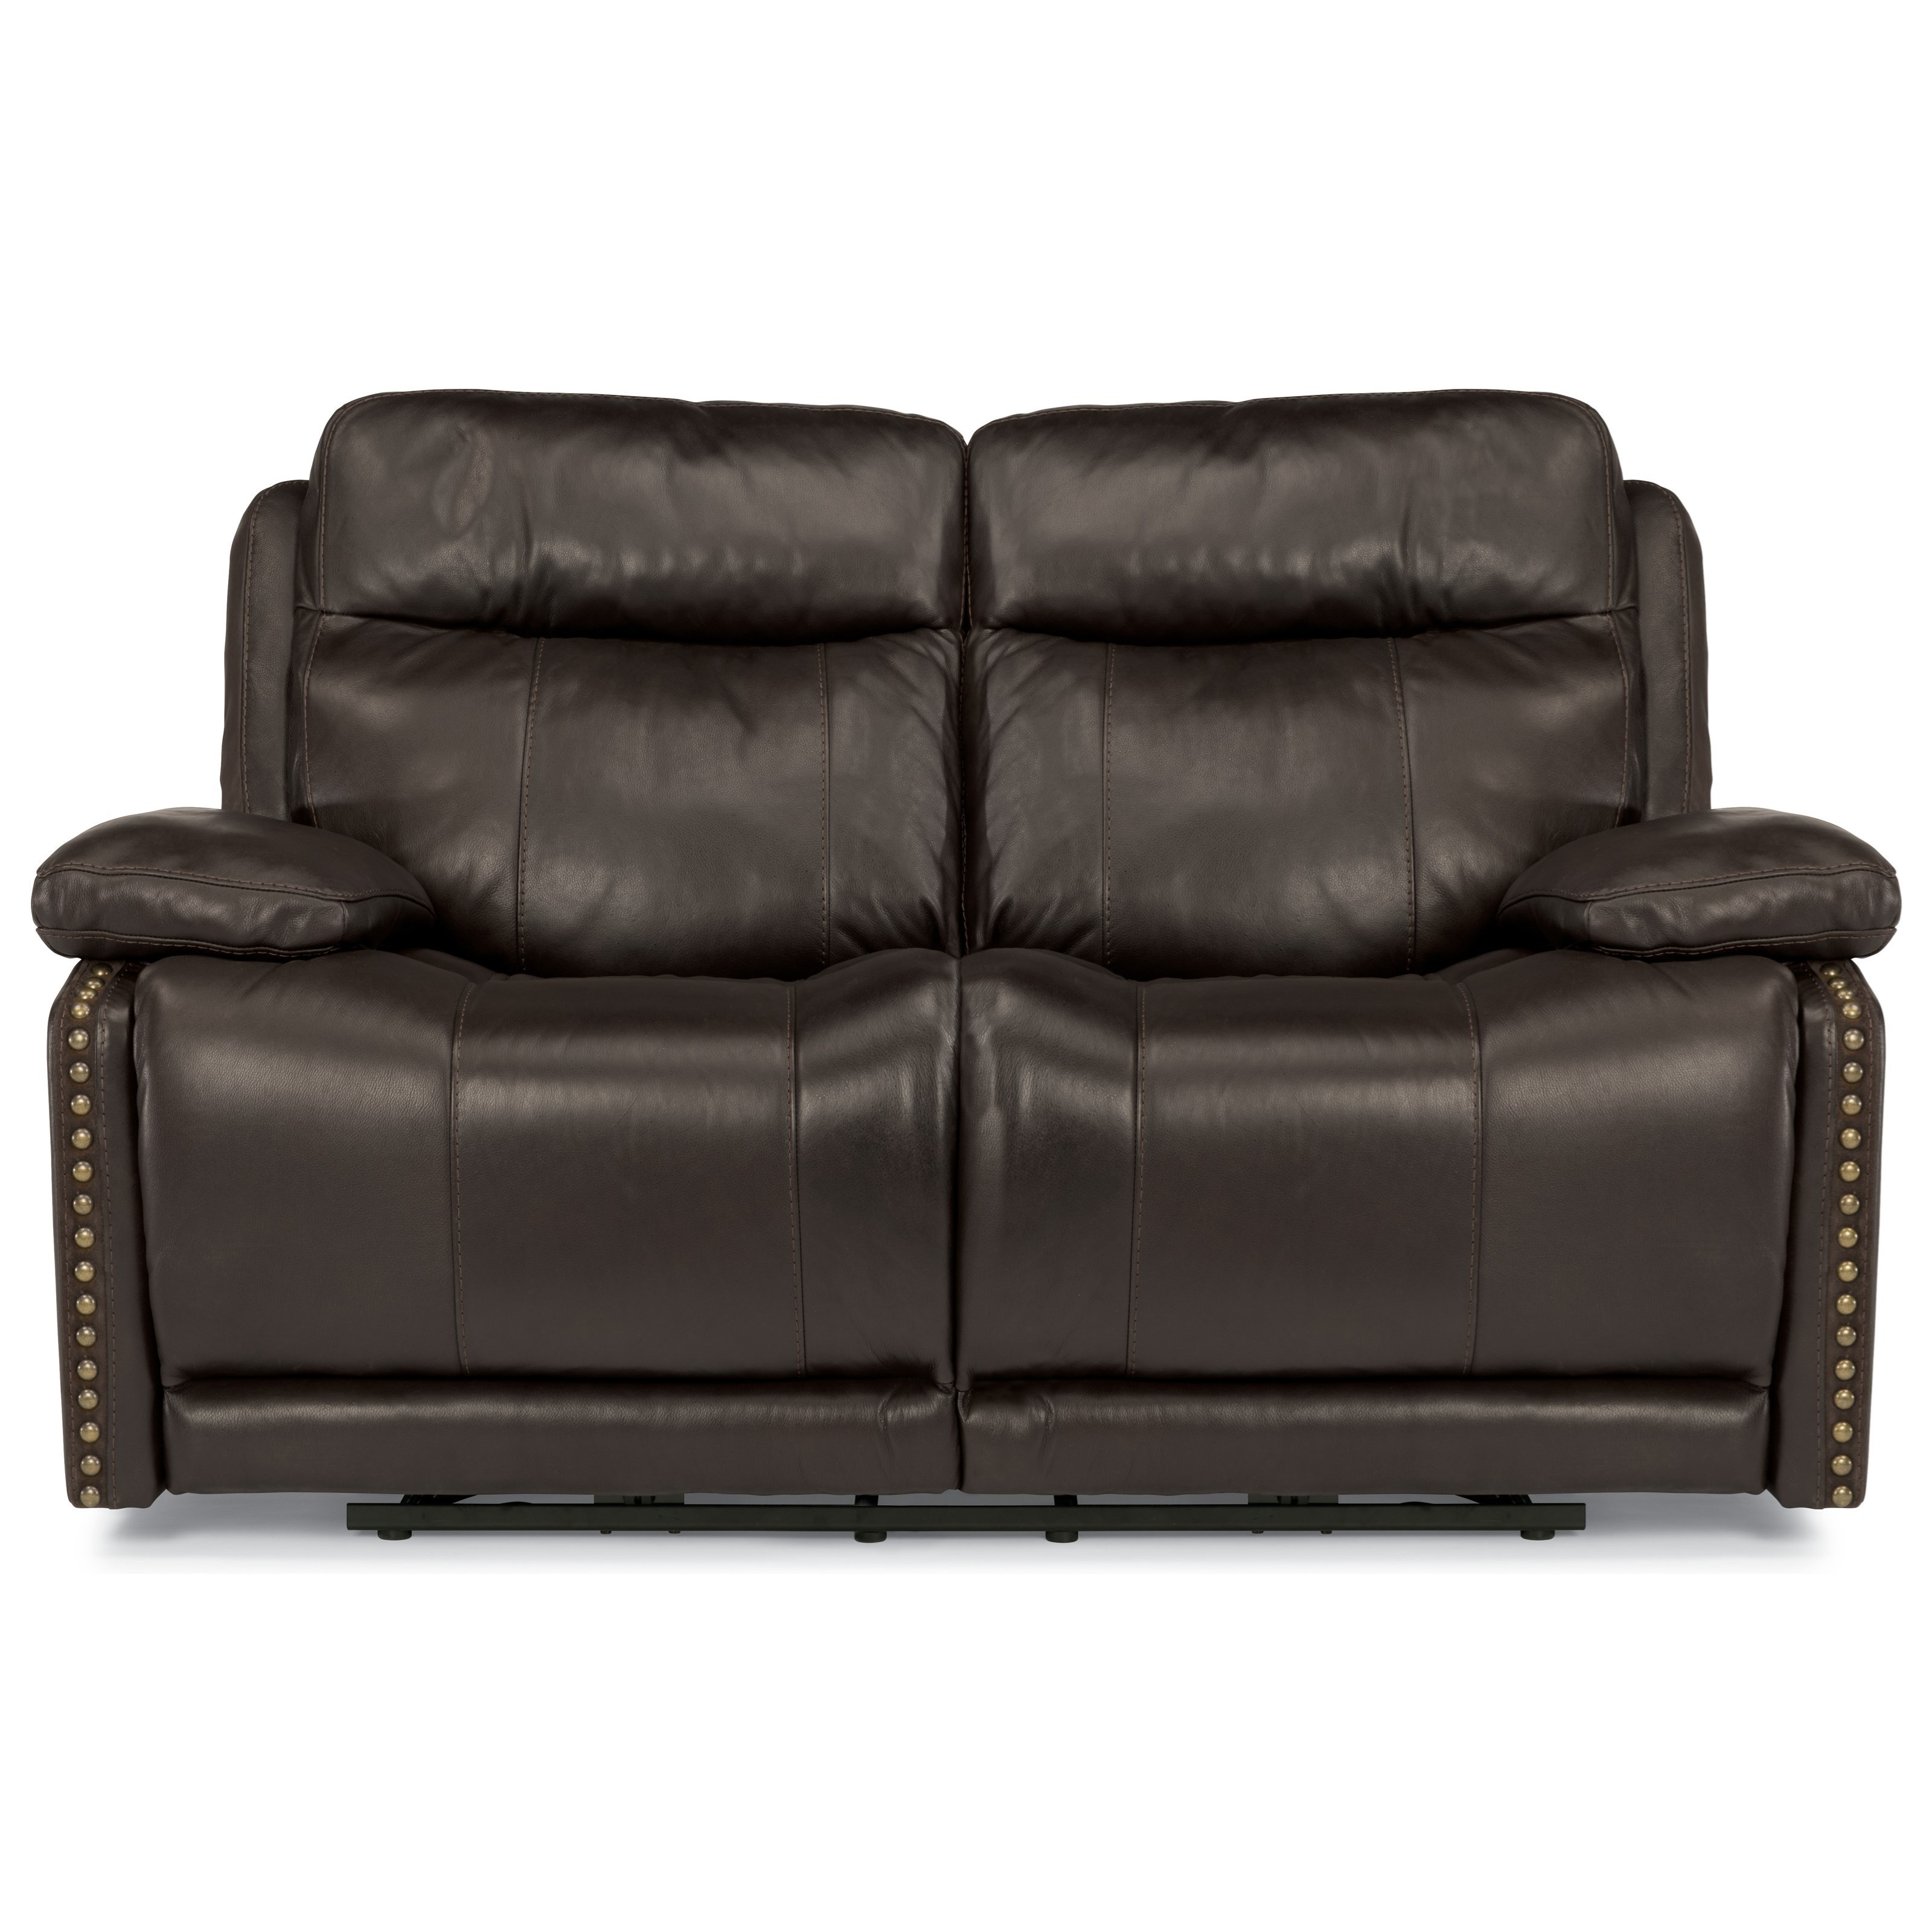 Flexsteel Latitudes-Russell Power Reclining Love Seat - Item Number: 1315-60PH